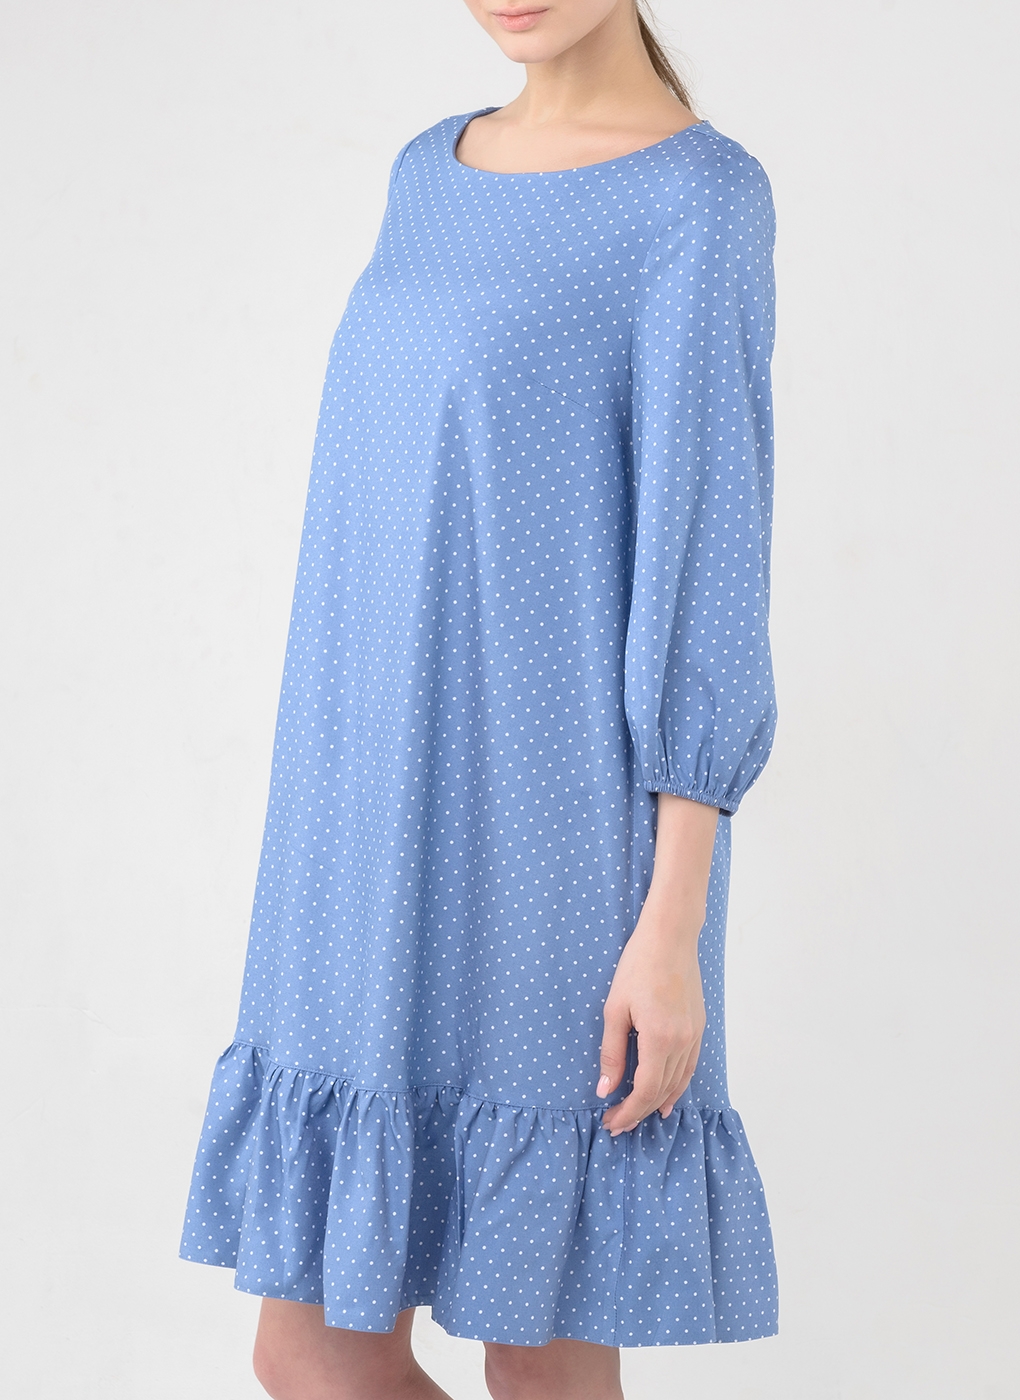 Платье 08, Remix фото